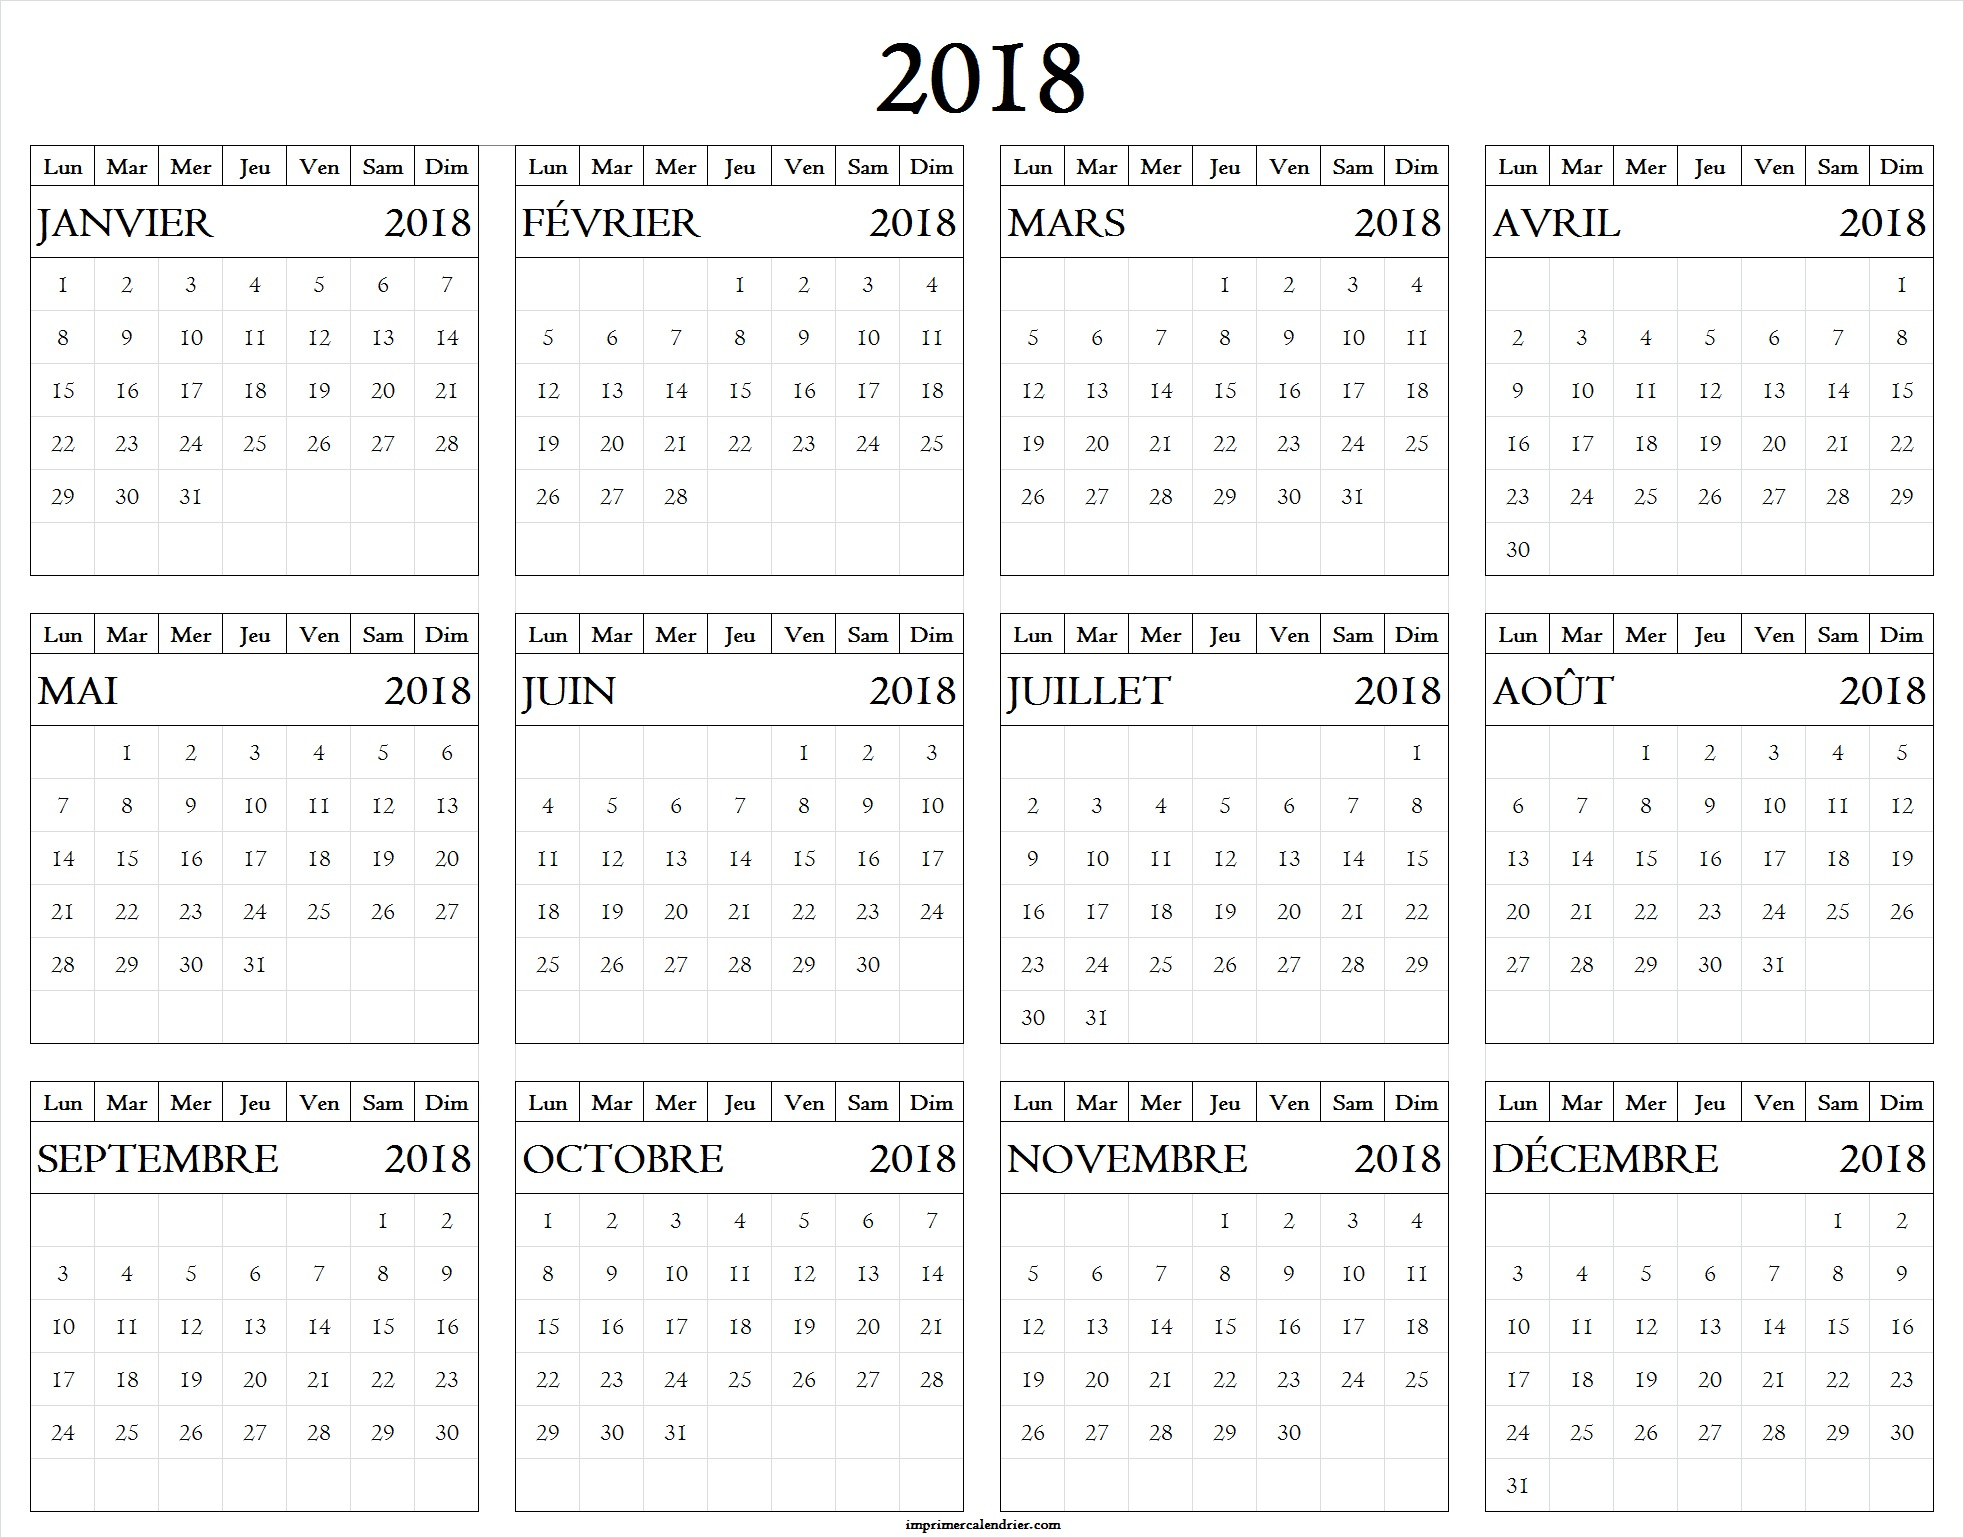 2018 Calendrier Archives - Page 7 Of 7 - Imprimer Calendrier serapportantà Calendrier Annuel 2018 À Imprimer